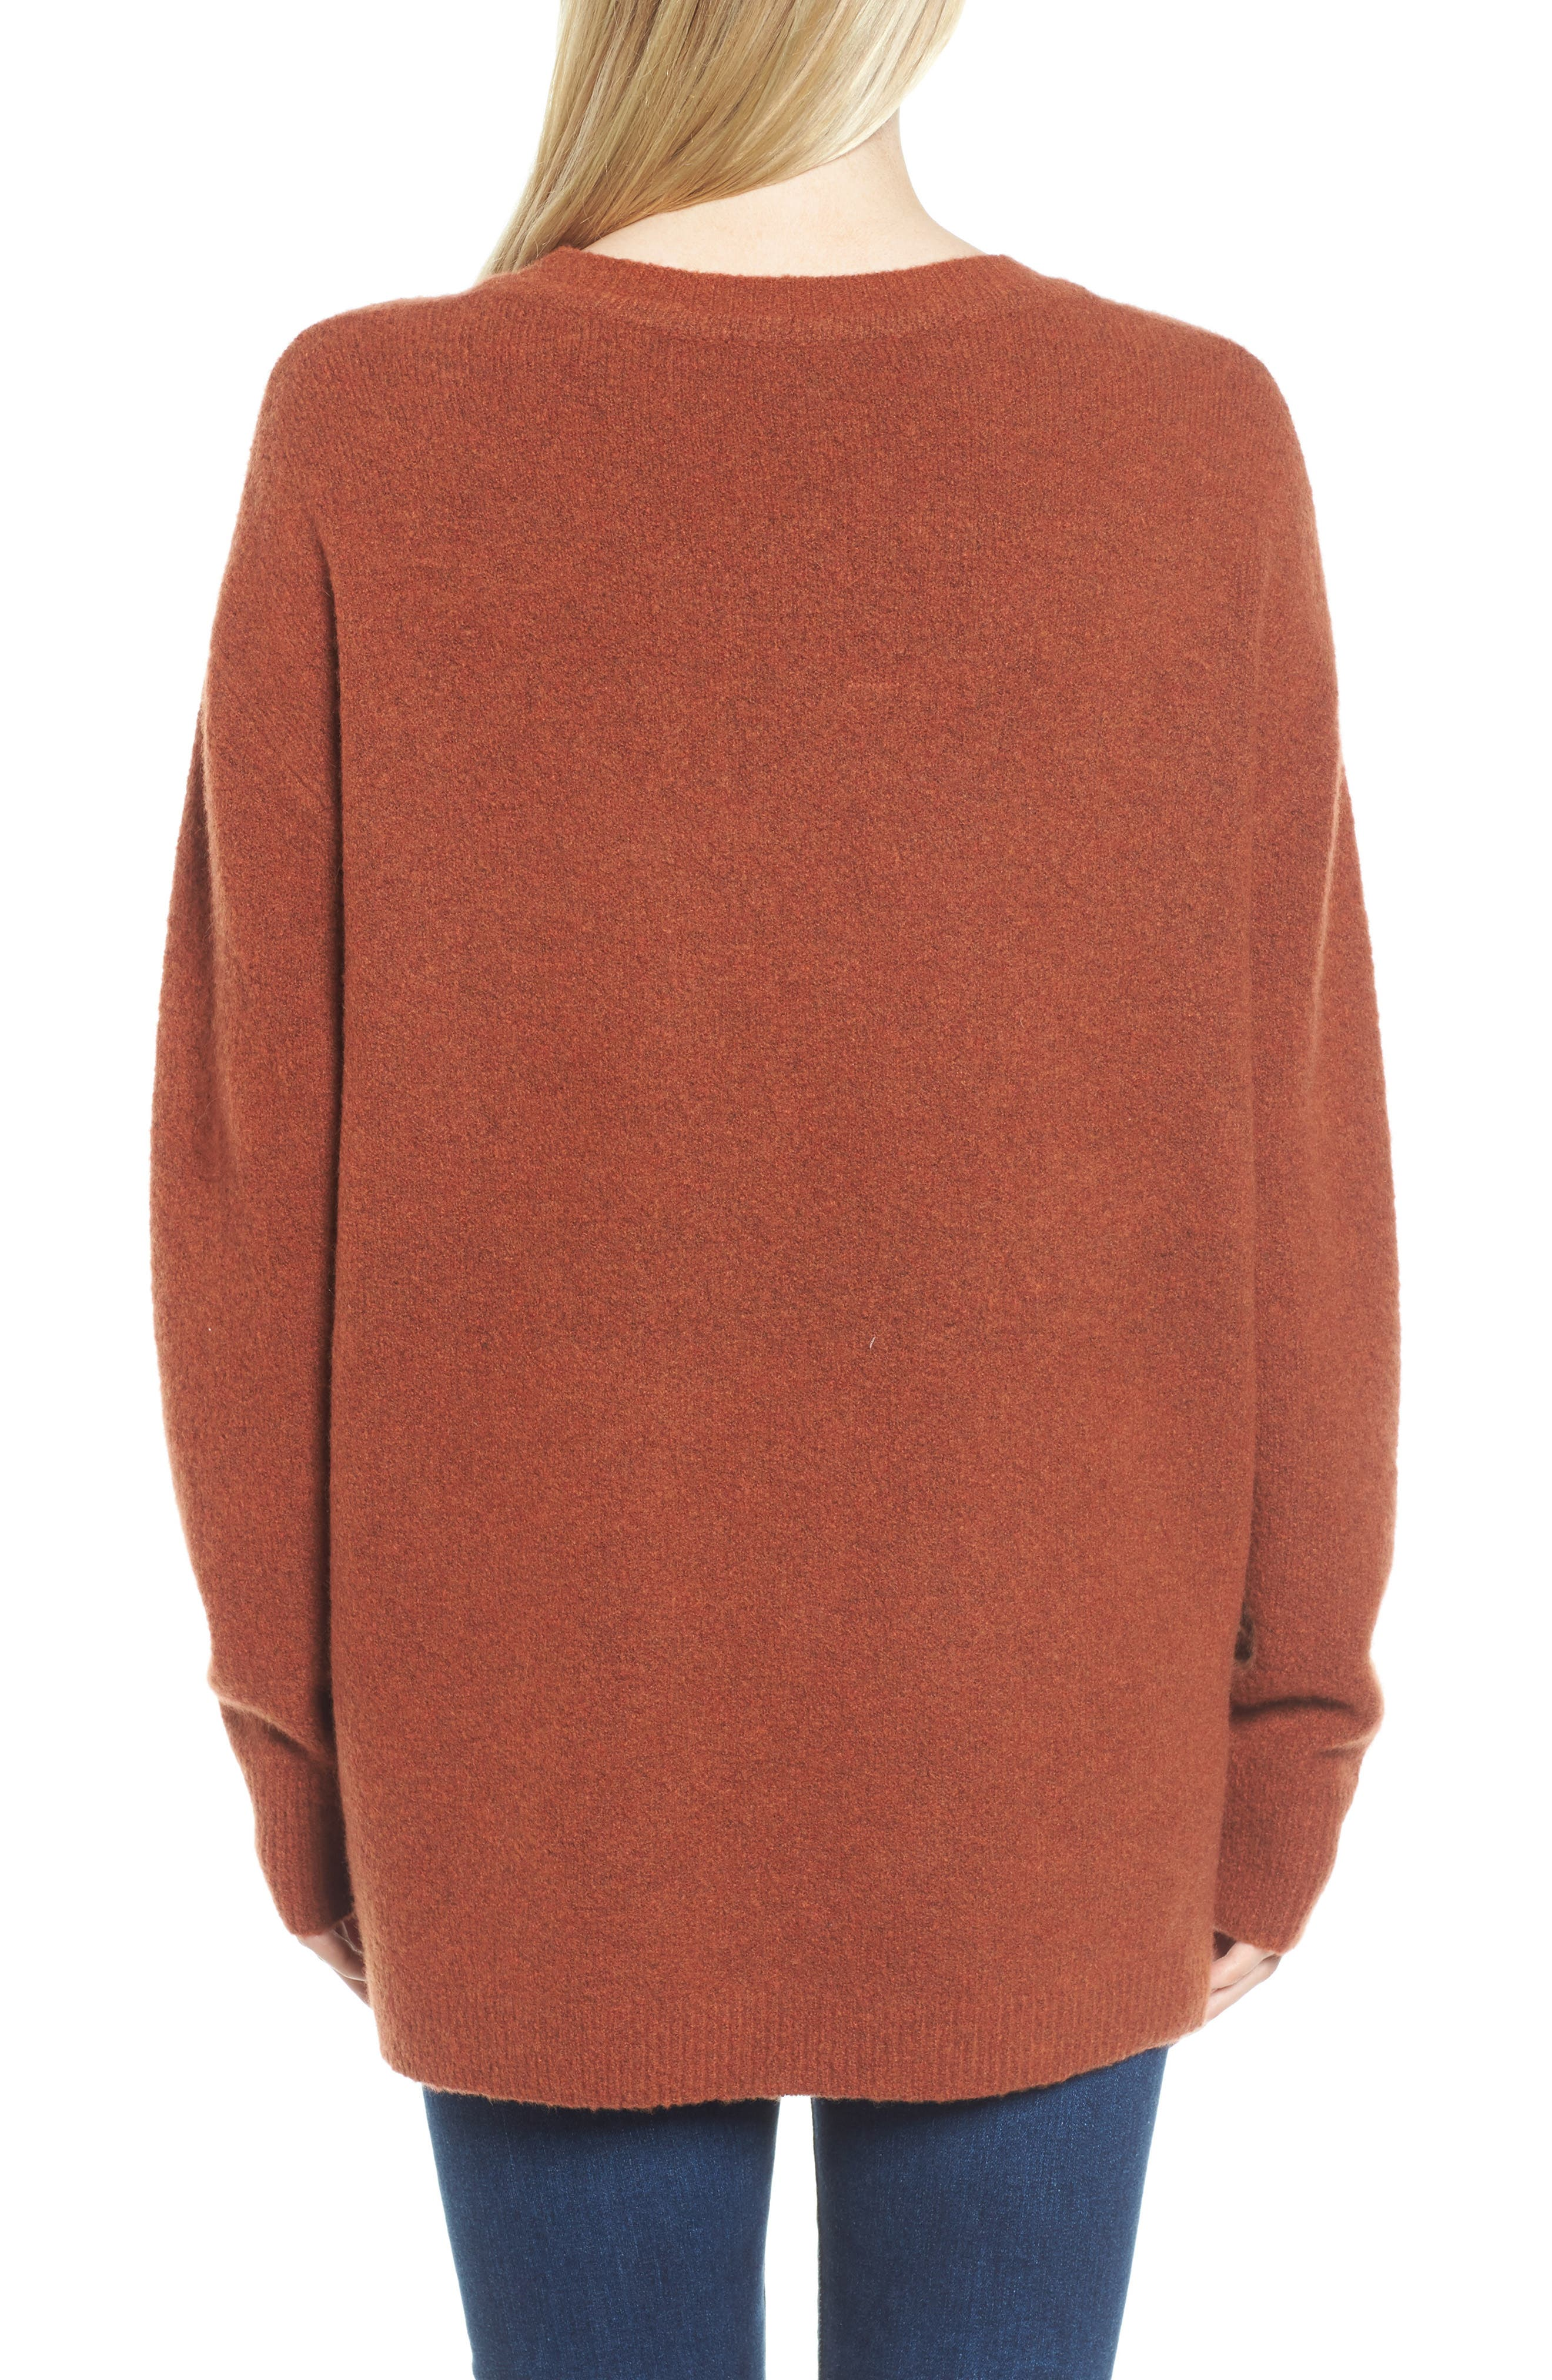 Oversize Cashmere Sweater,                             Alternate thumbnail 2, color,                             806